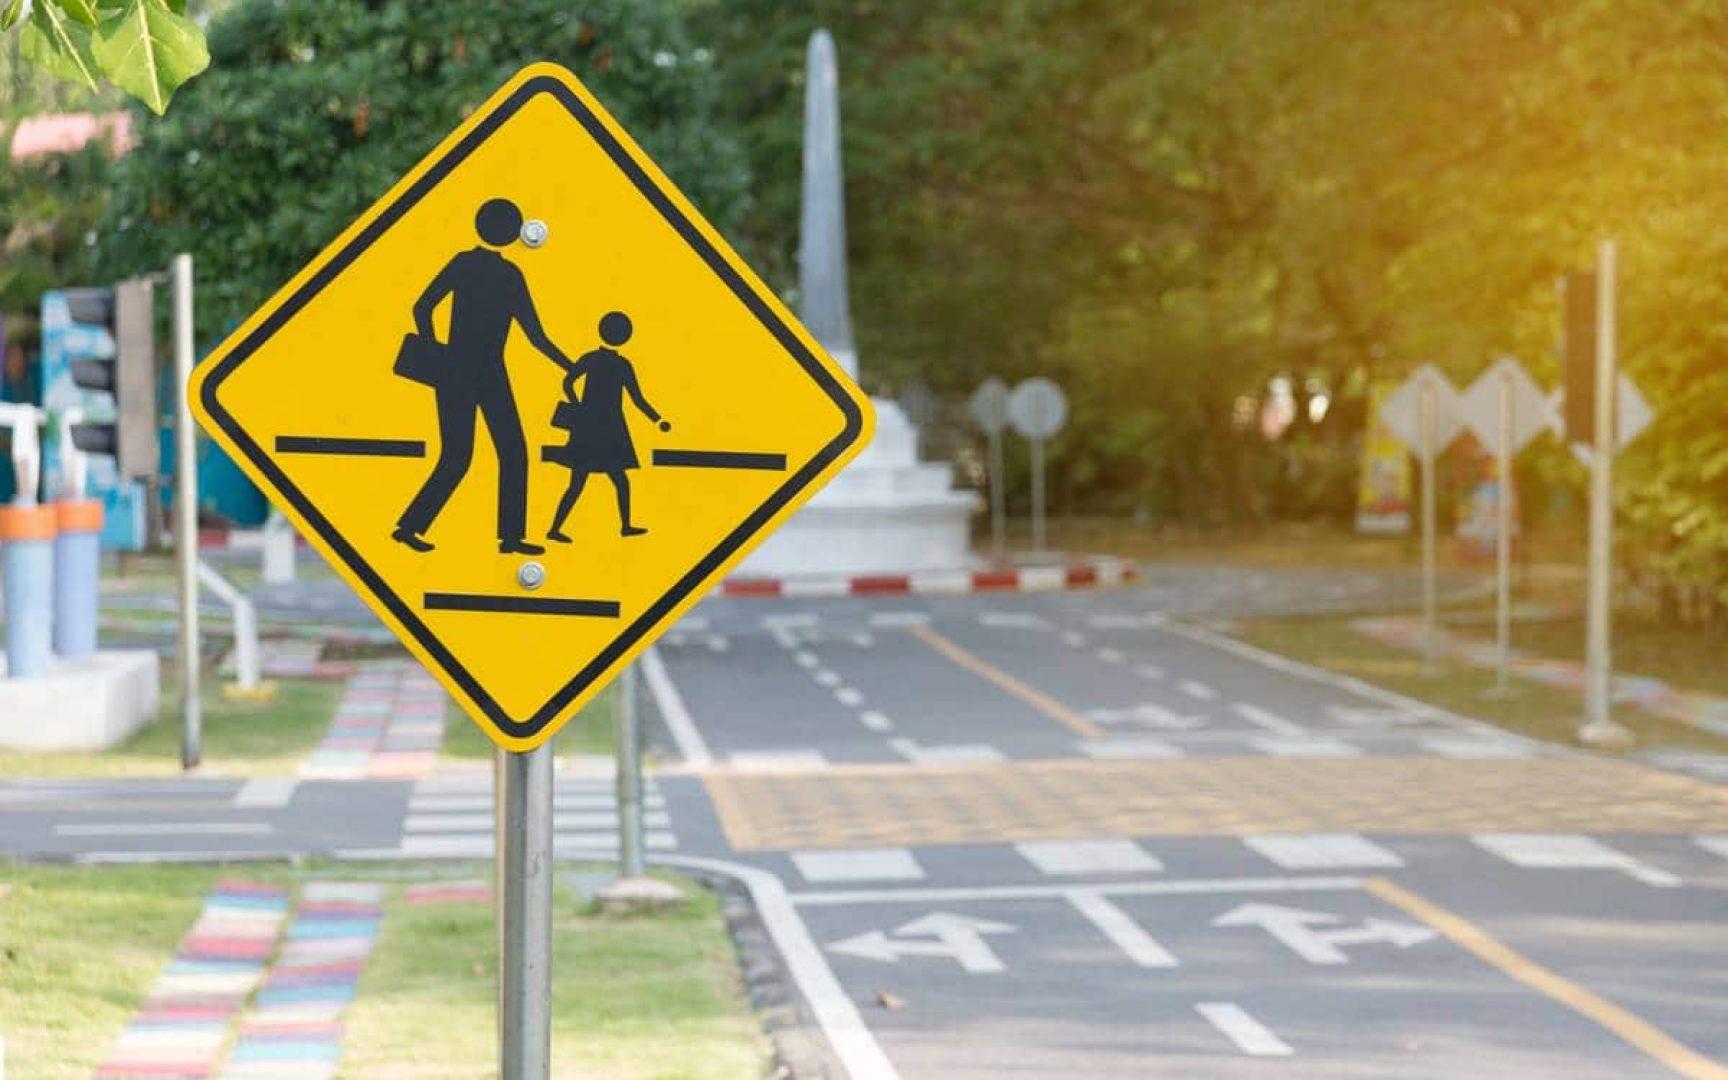 School crossing sign in a nice neighborhood